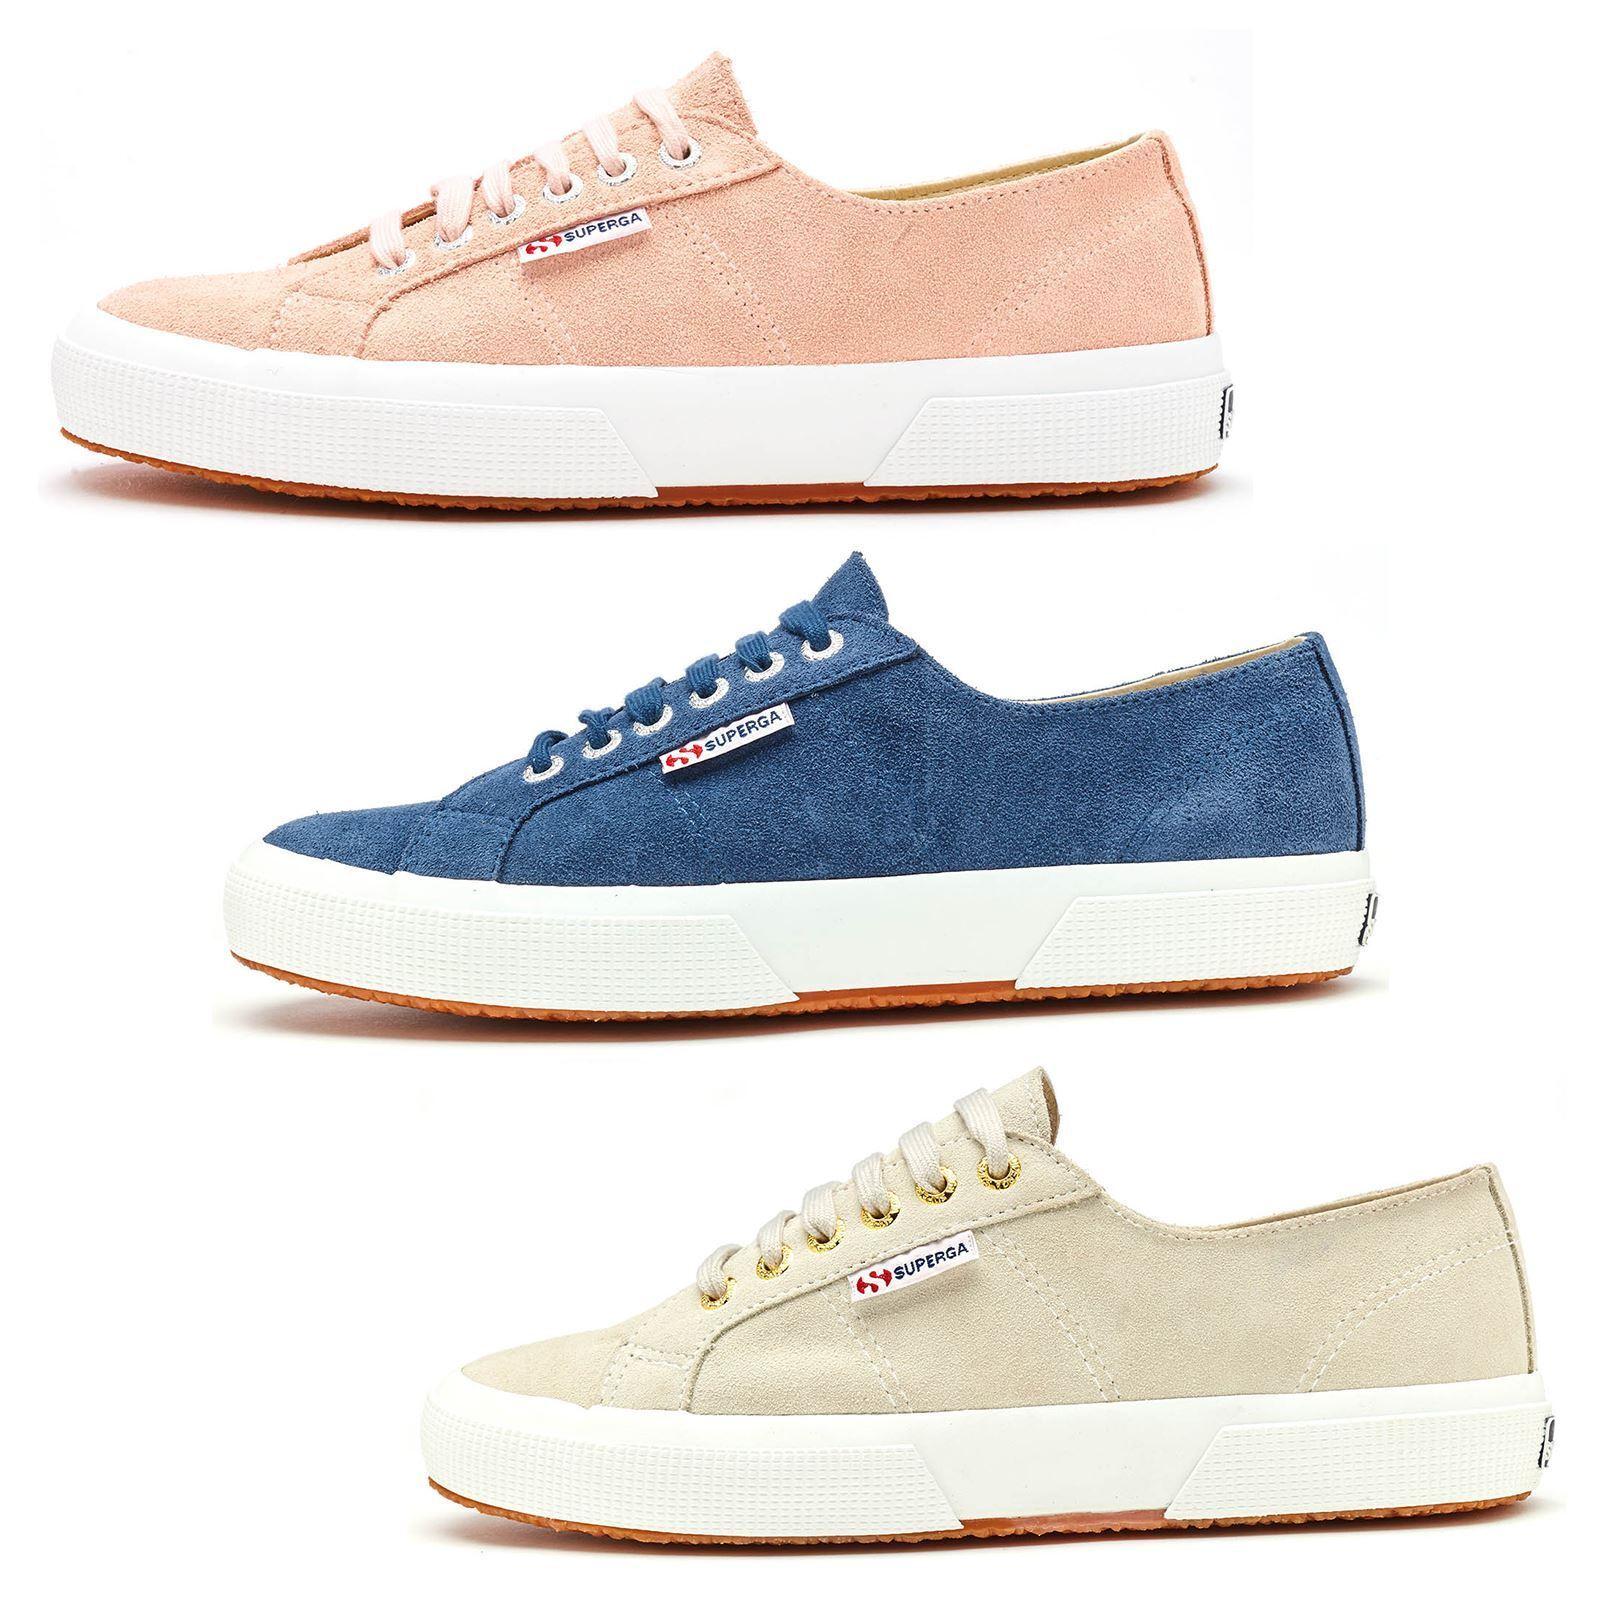 Superga 2750 Sueu Suede Trainers in bluee Shadow, White Cream & Pink Skin